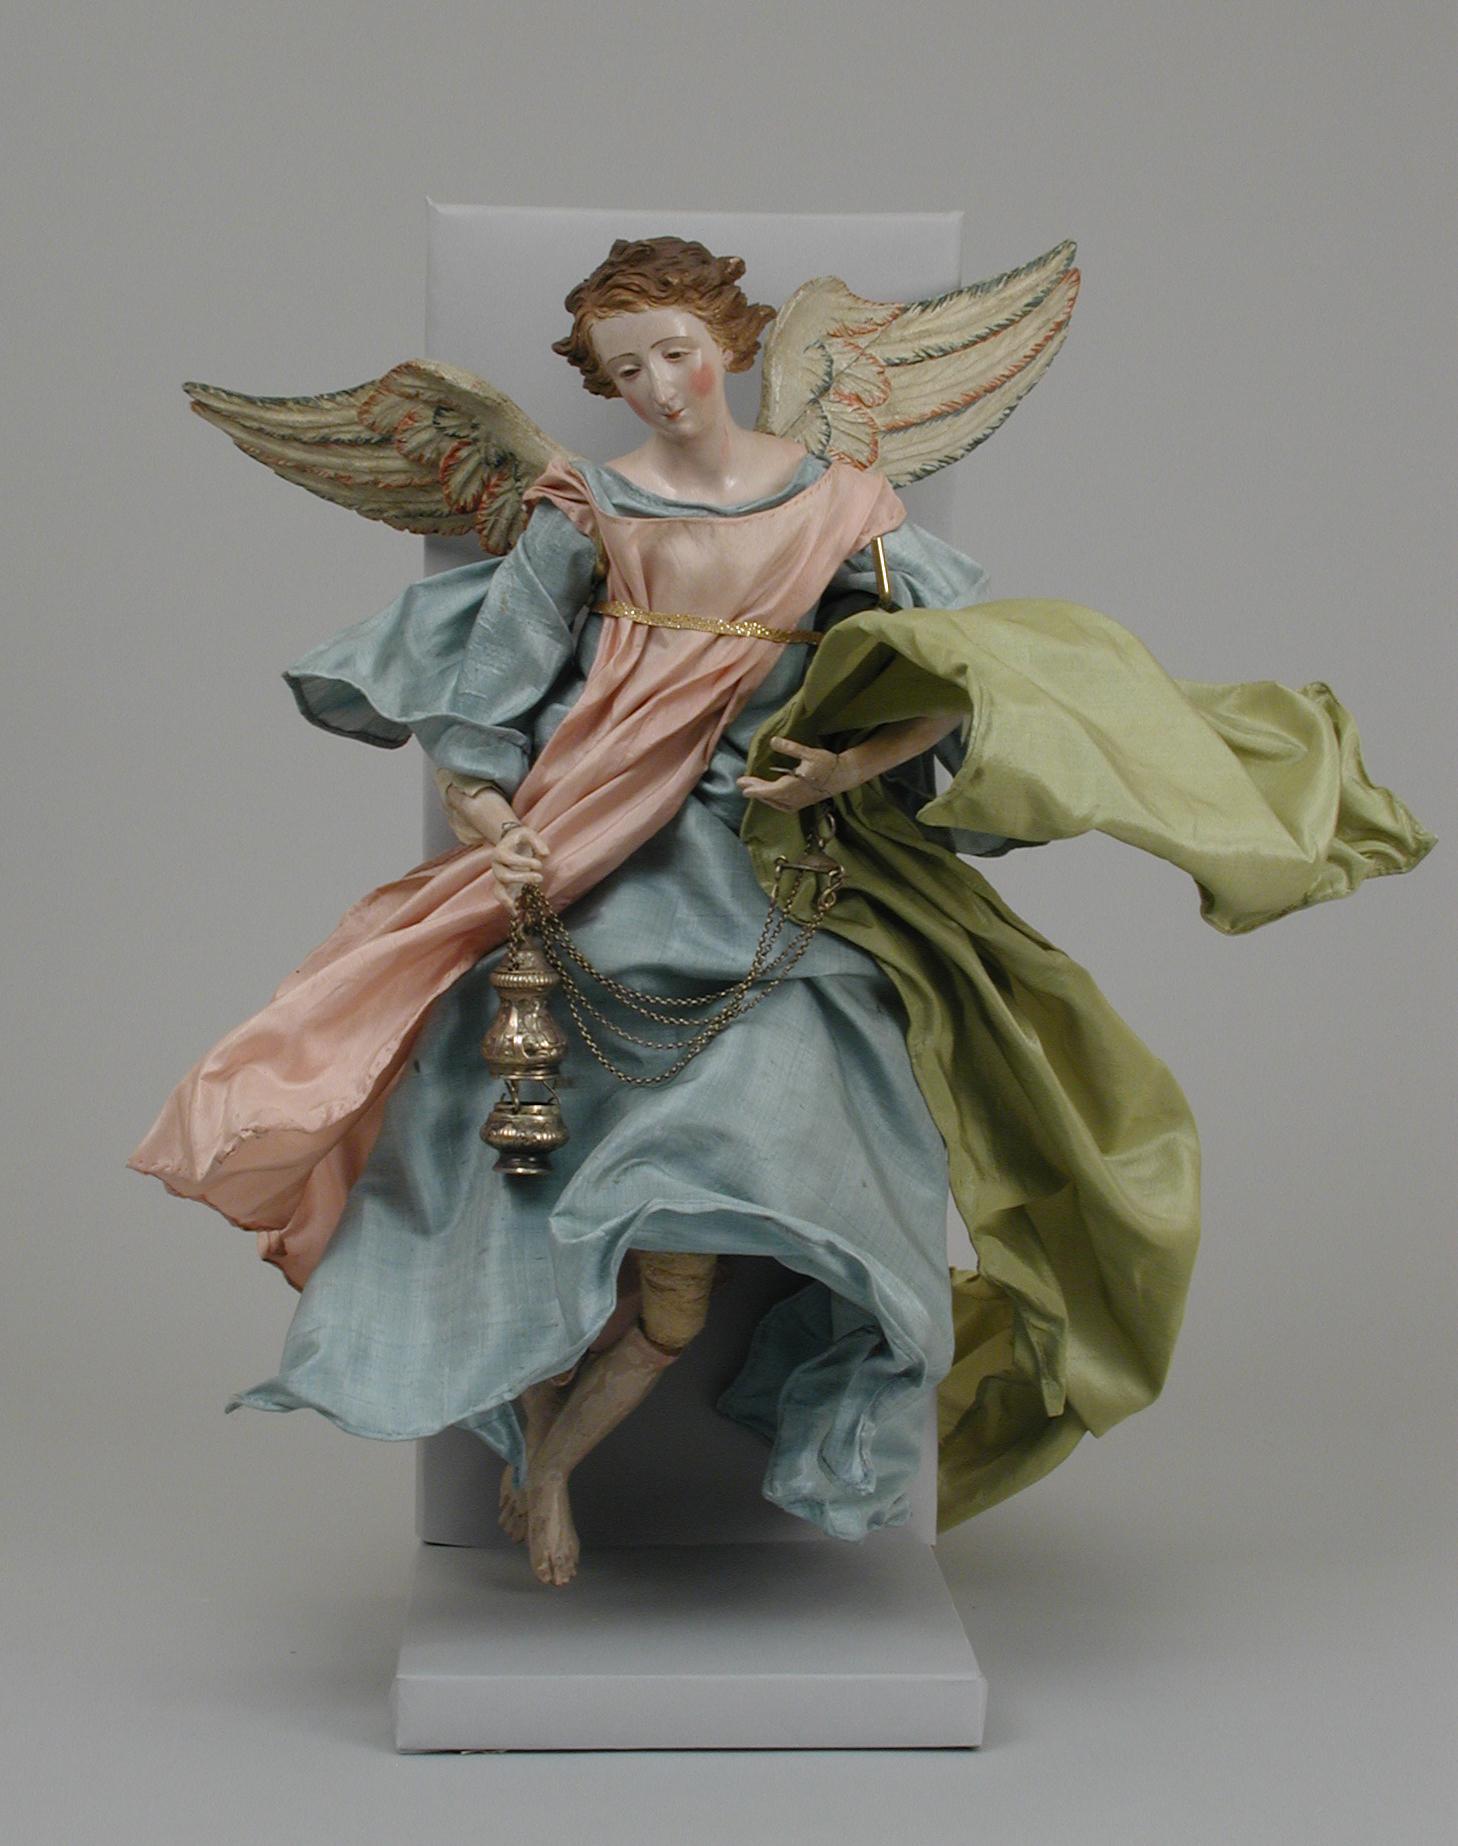 https://images.metmuseum.org/CRDImages/es/original/LC-64_164_14.jpg